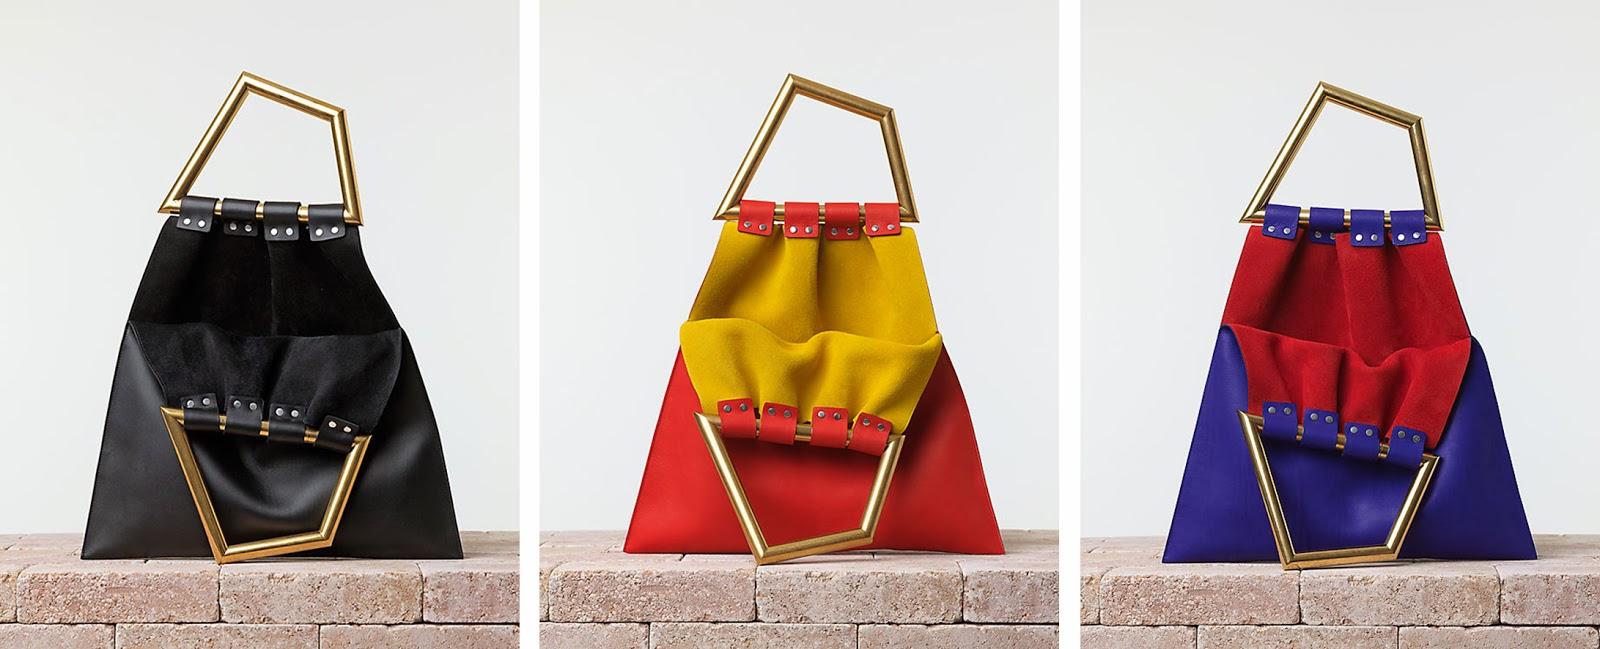 celine luggage mini - TE DORE: C��LINE��S S/S 2014 VIEW IN FULL